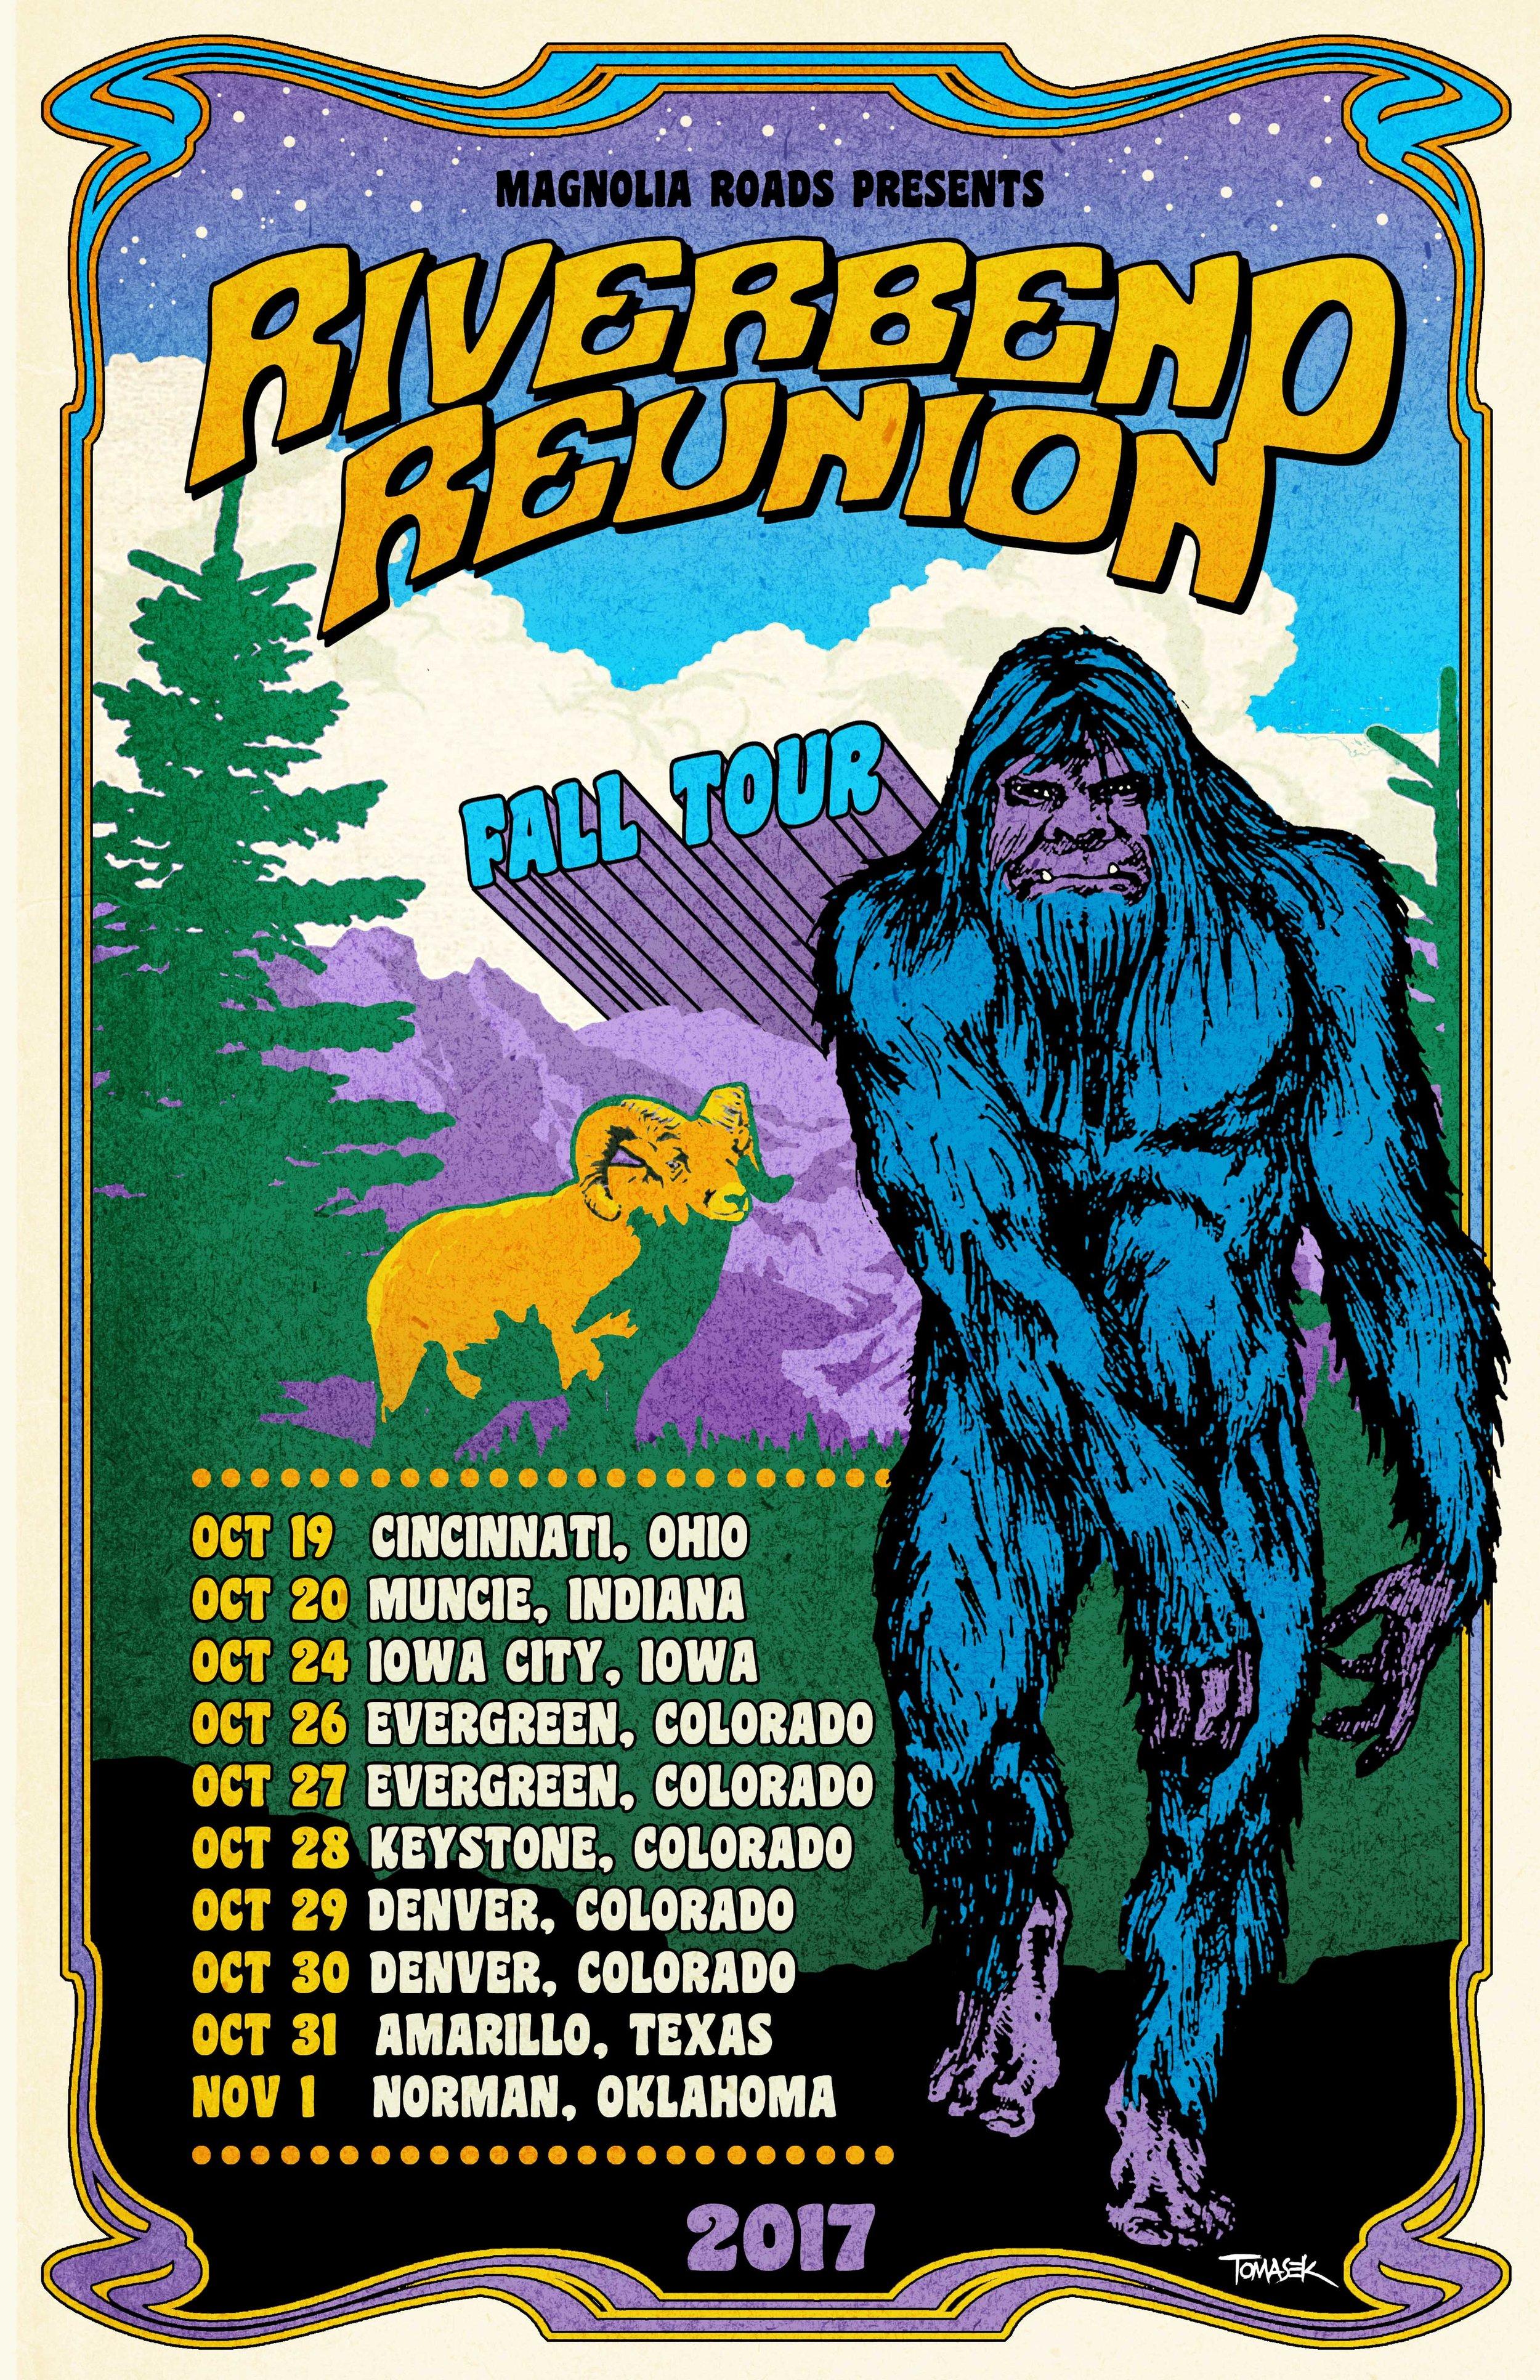 Riverbend Reunion Fall Tour 17.jpg